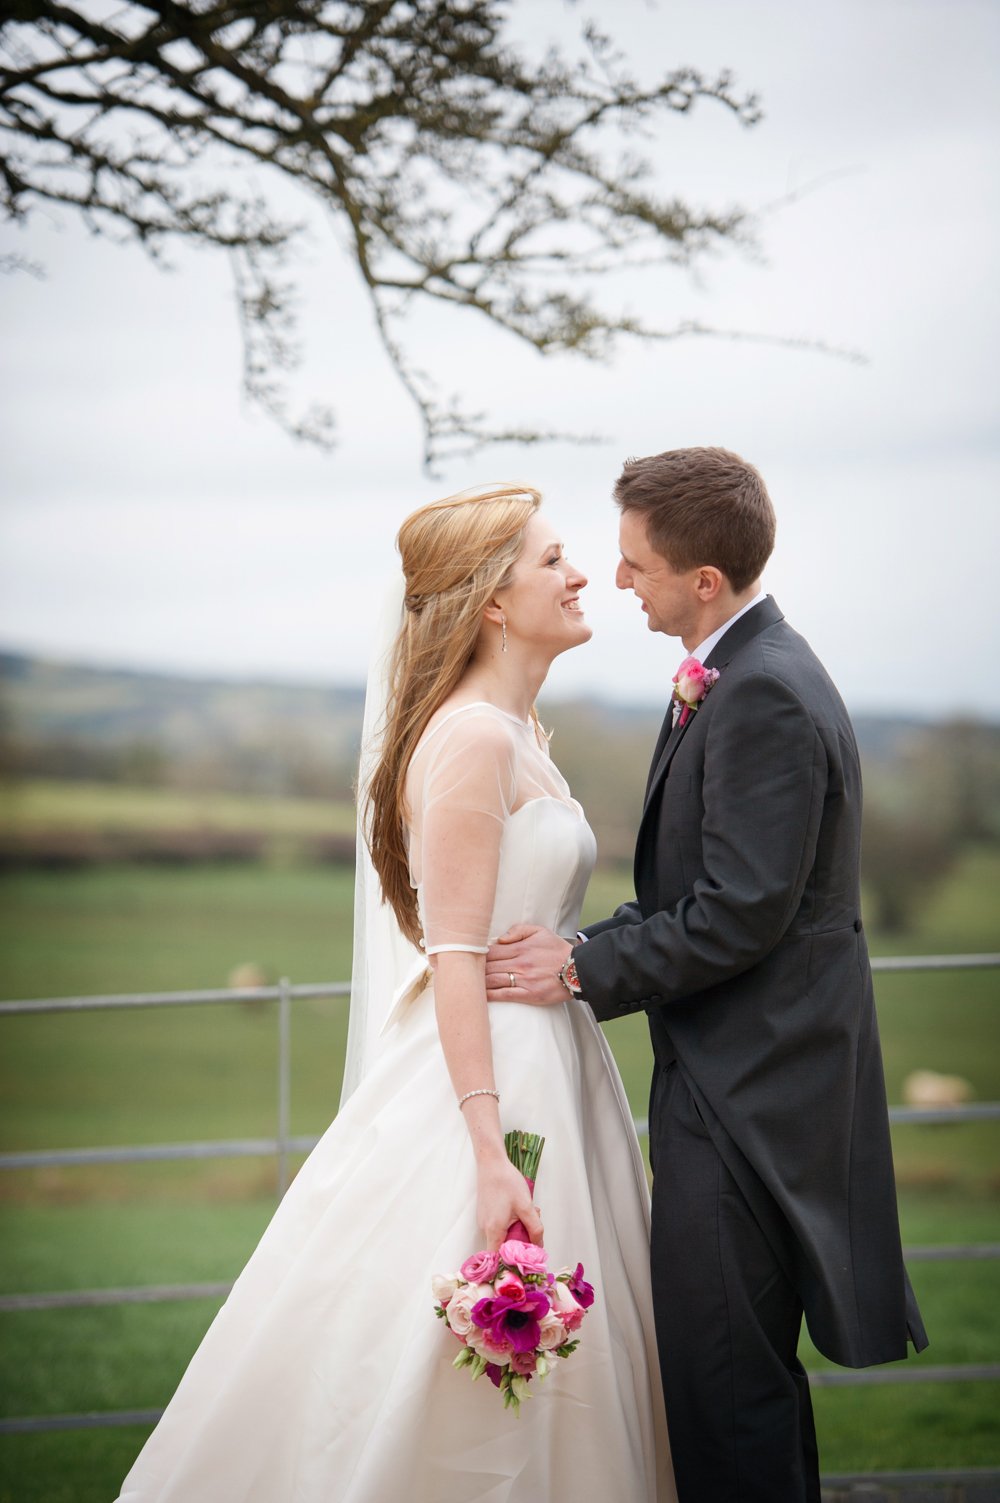 Clonabreany House Wedding Photography_084.jpg